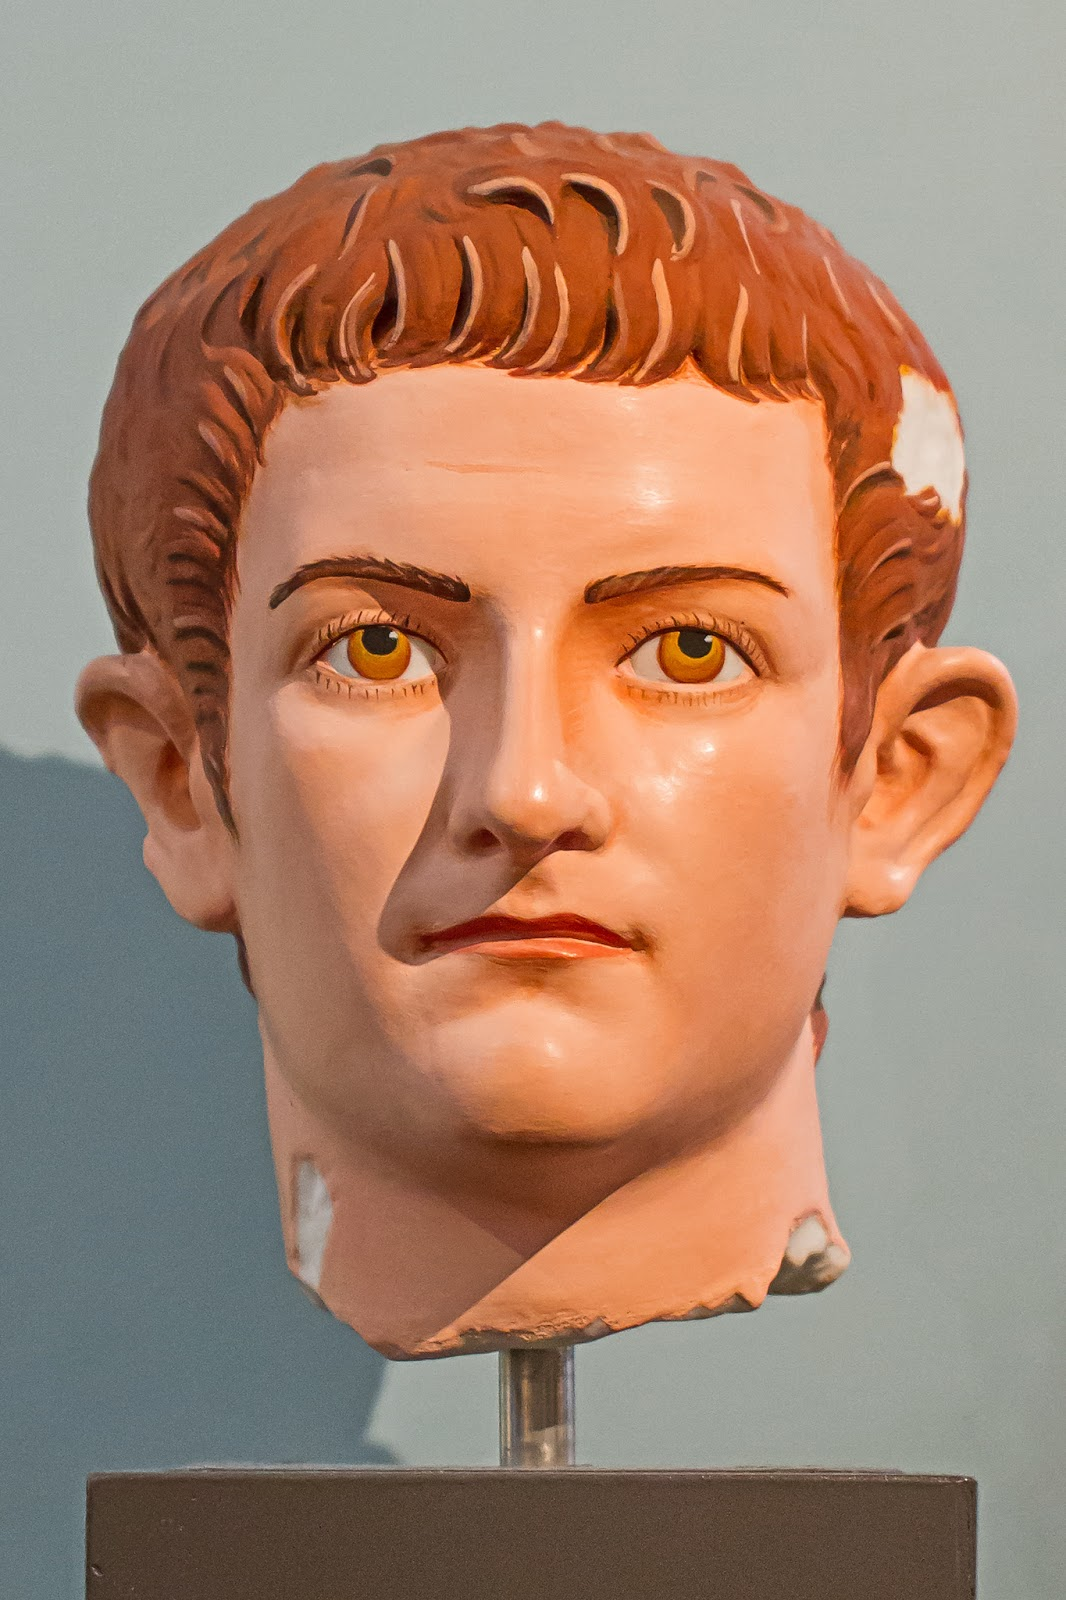 A bust of Emperor Caligula